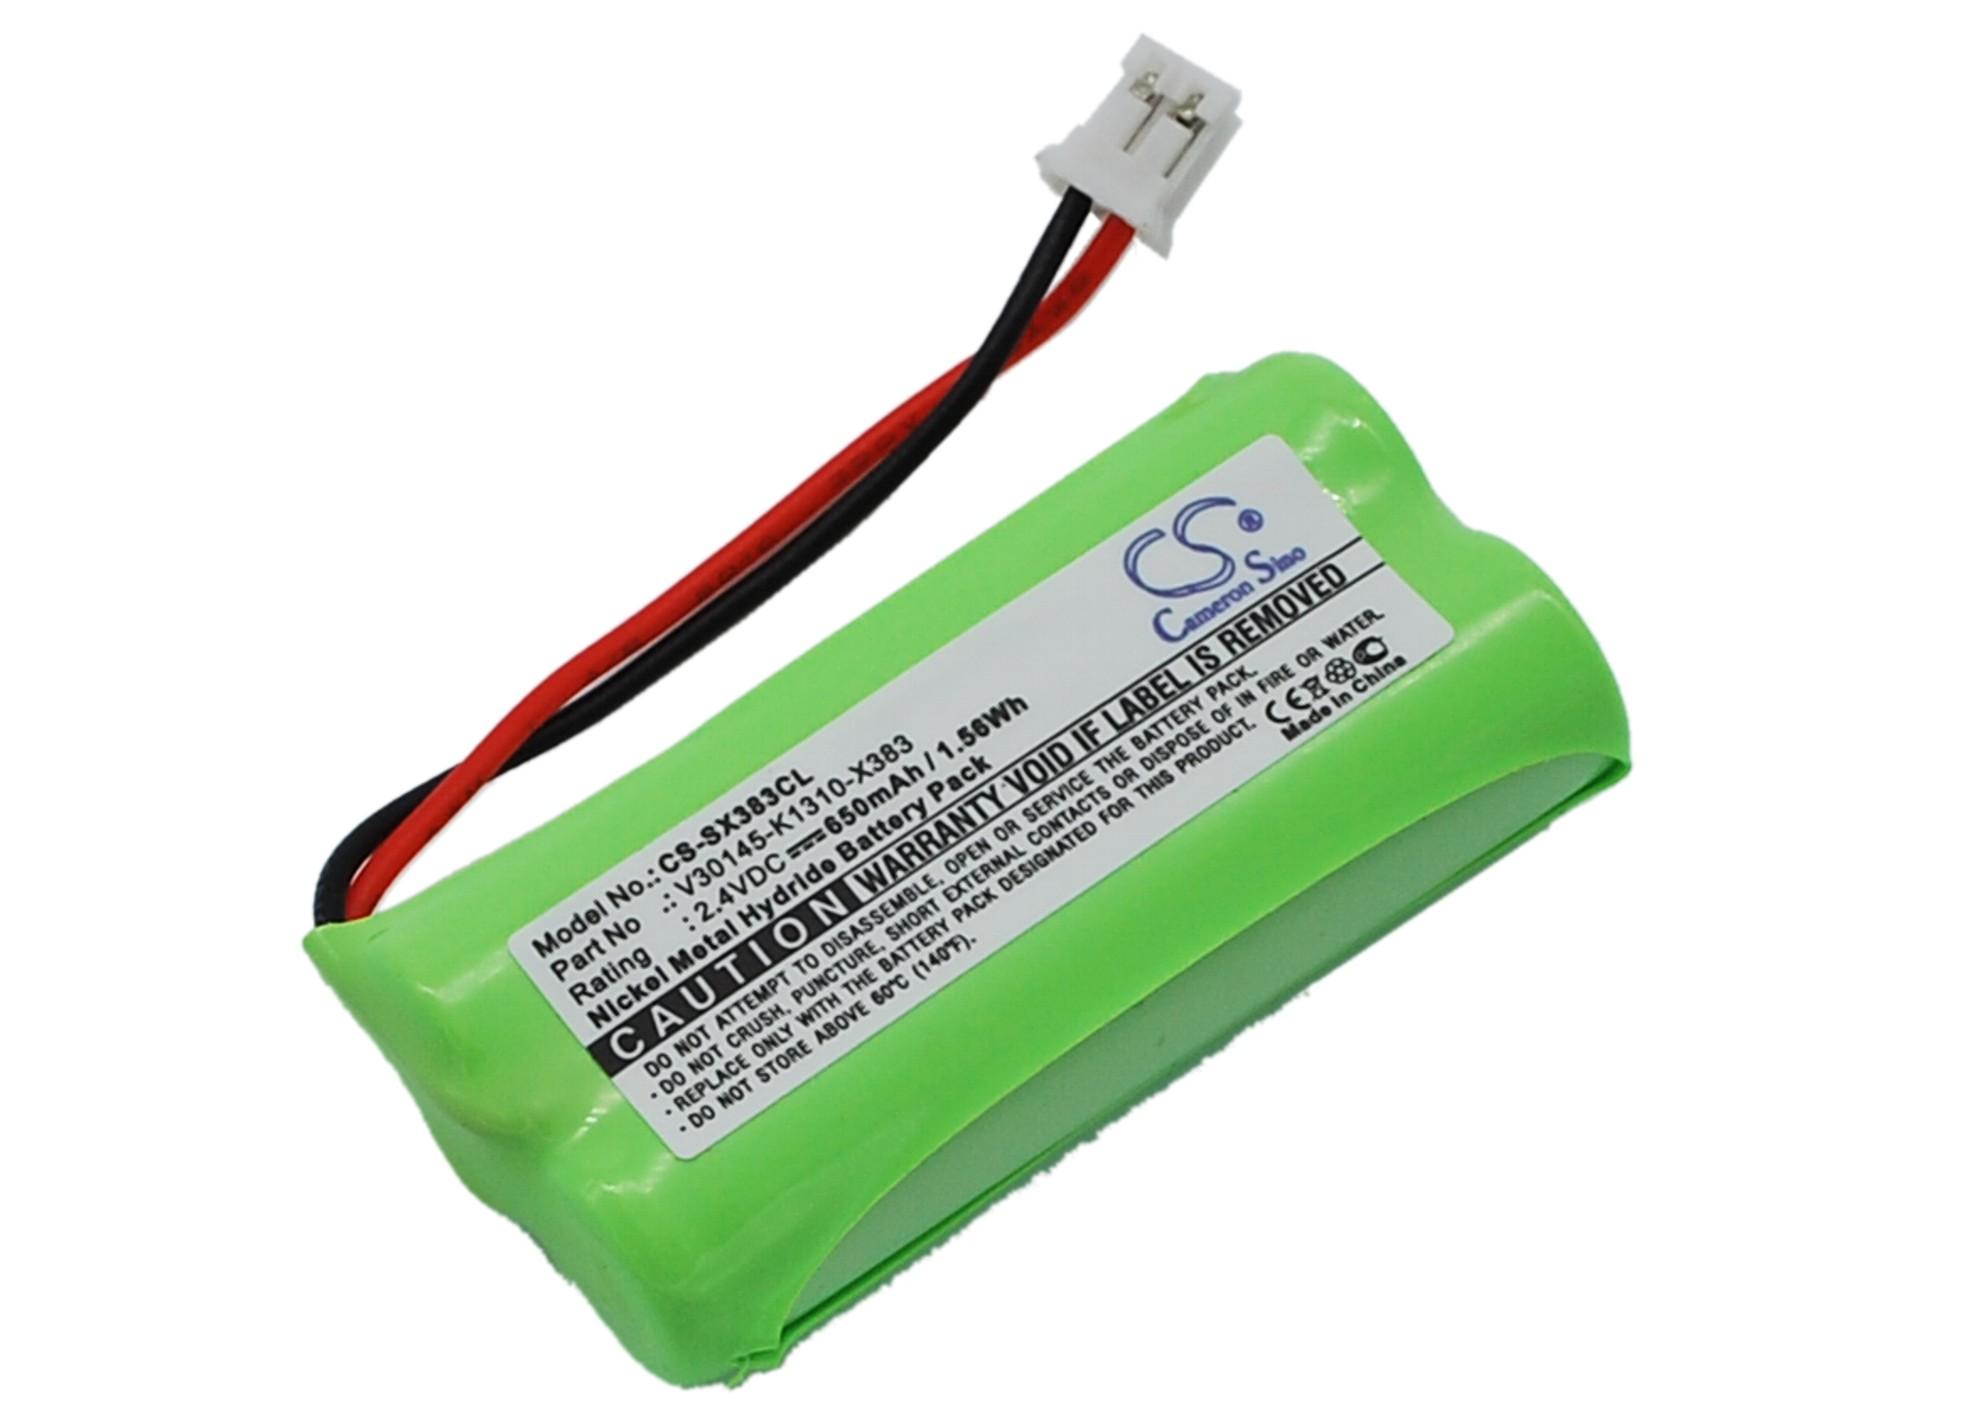 Cameron Sino baterie do bezdrátových telefonů pro SIEMENS Gigaset AS150 Duo 2.4V Ni-MH 650mAh černá - neoriginální